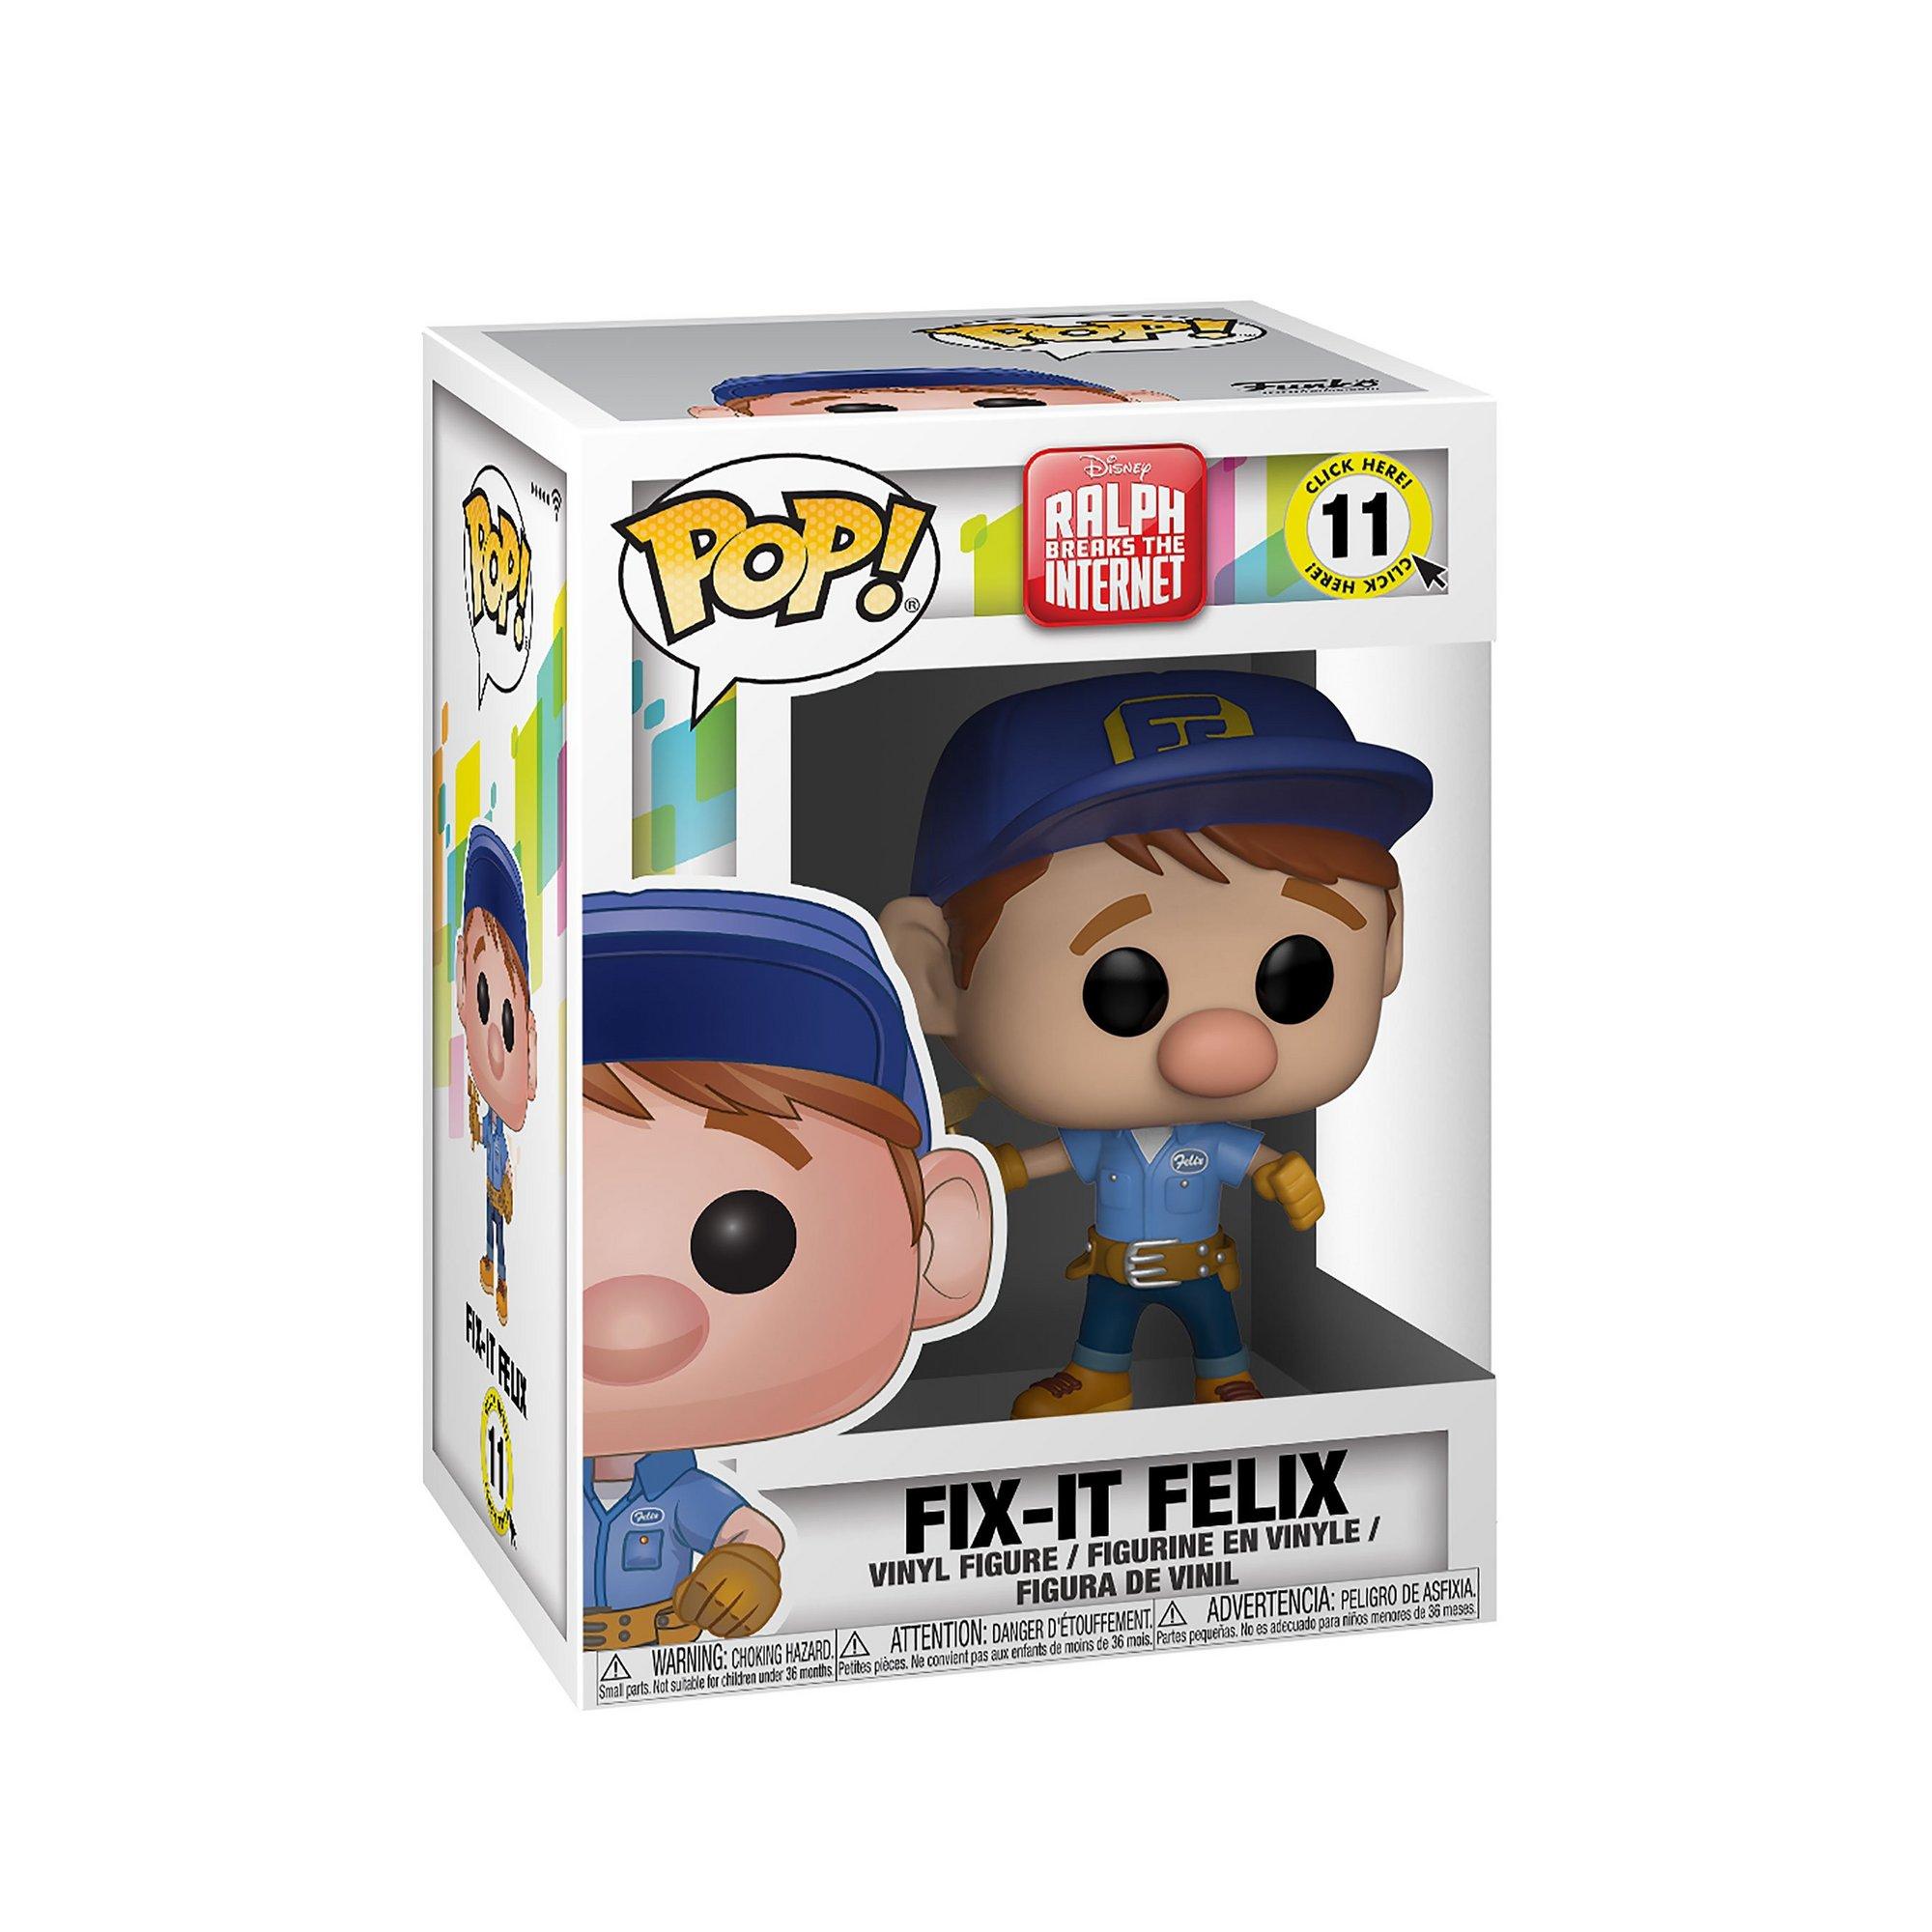 Image of Funko POP! Disney Wreck It Ralph 2 Fix-It Felix Figure